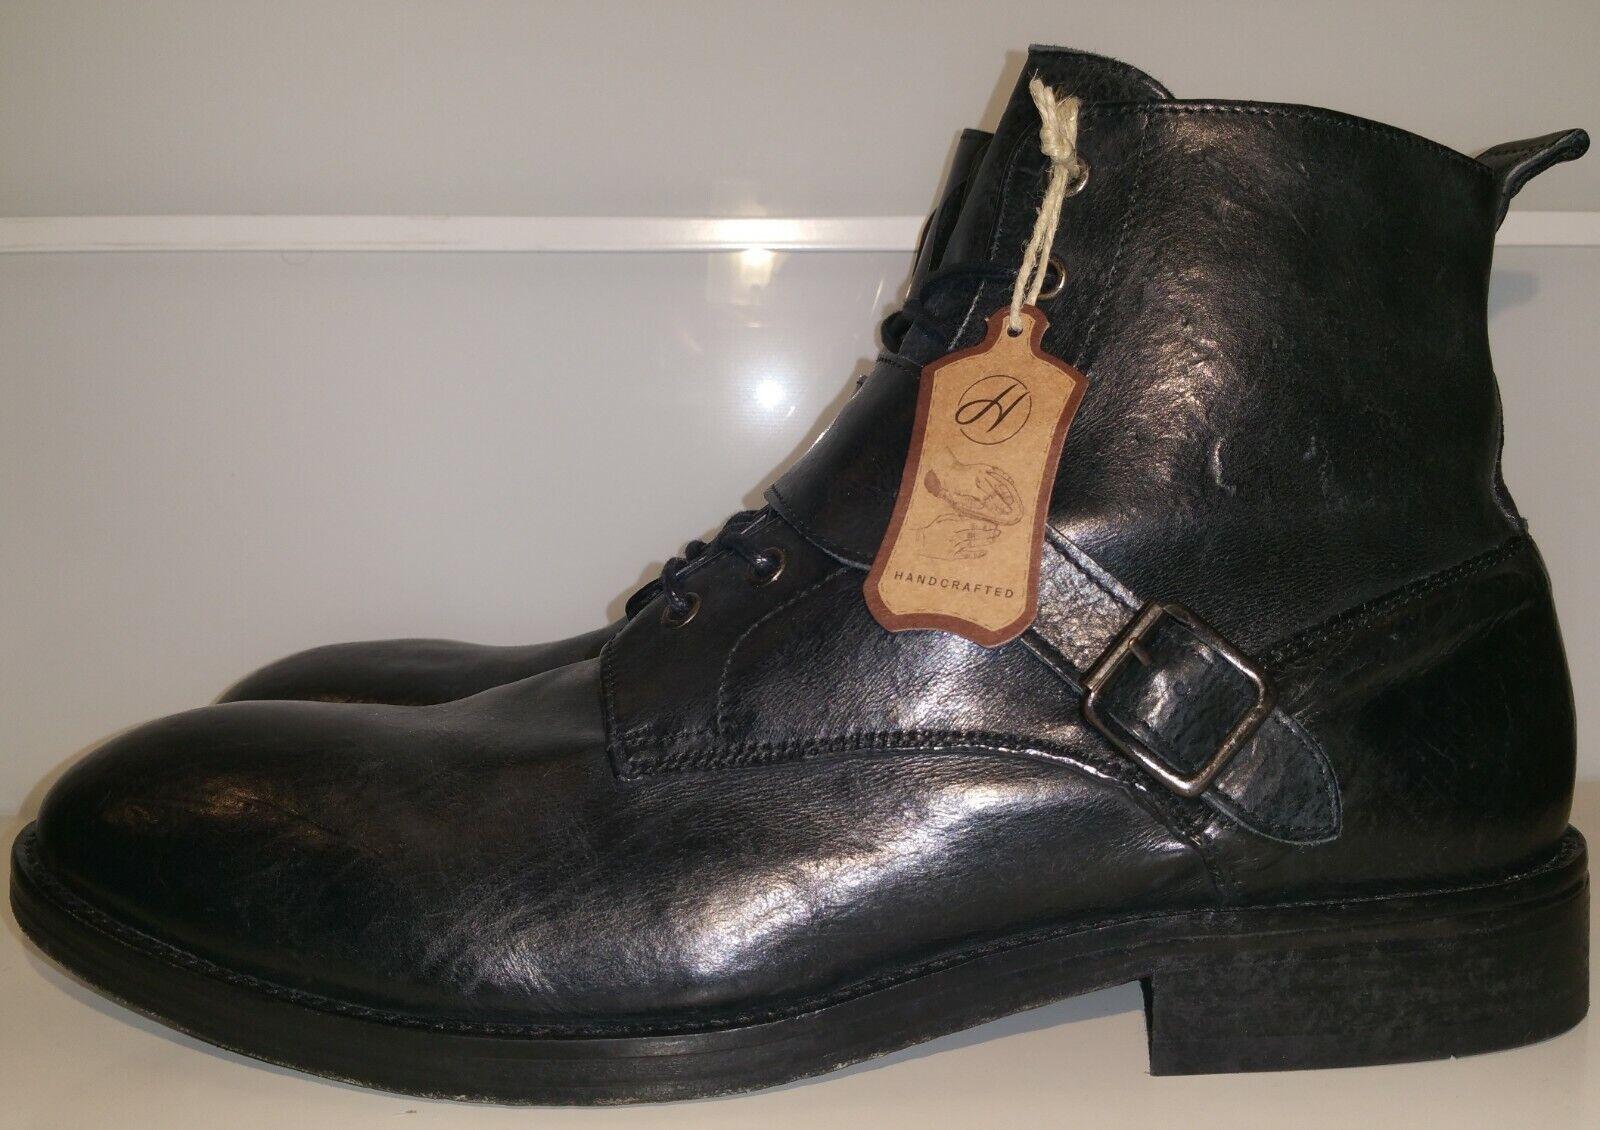 nuevo  h by Hudson London  45   botas botines botas   Zapatos Cuero   negro  Biker